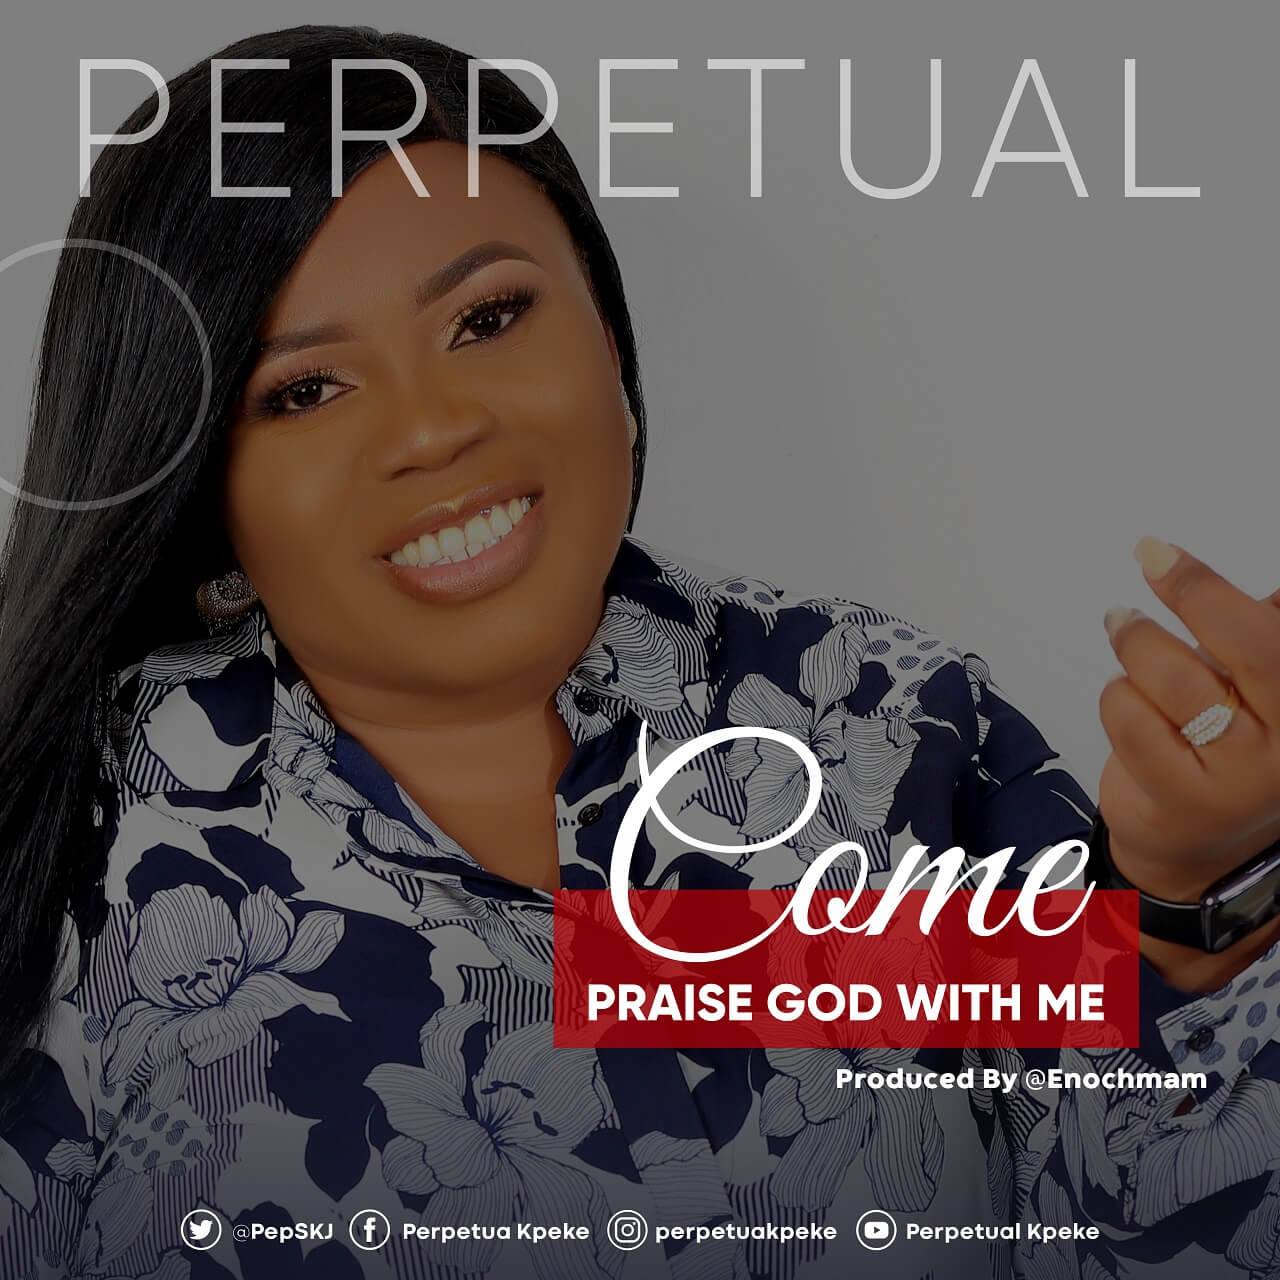 Praise God With Me By Perpetual Kpeke